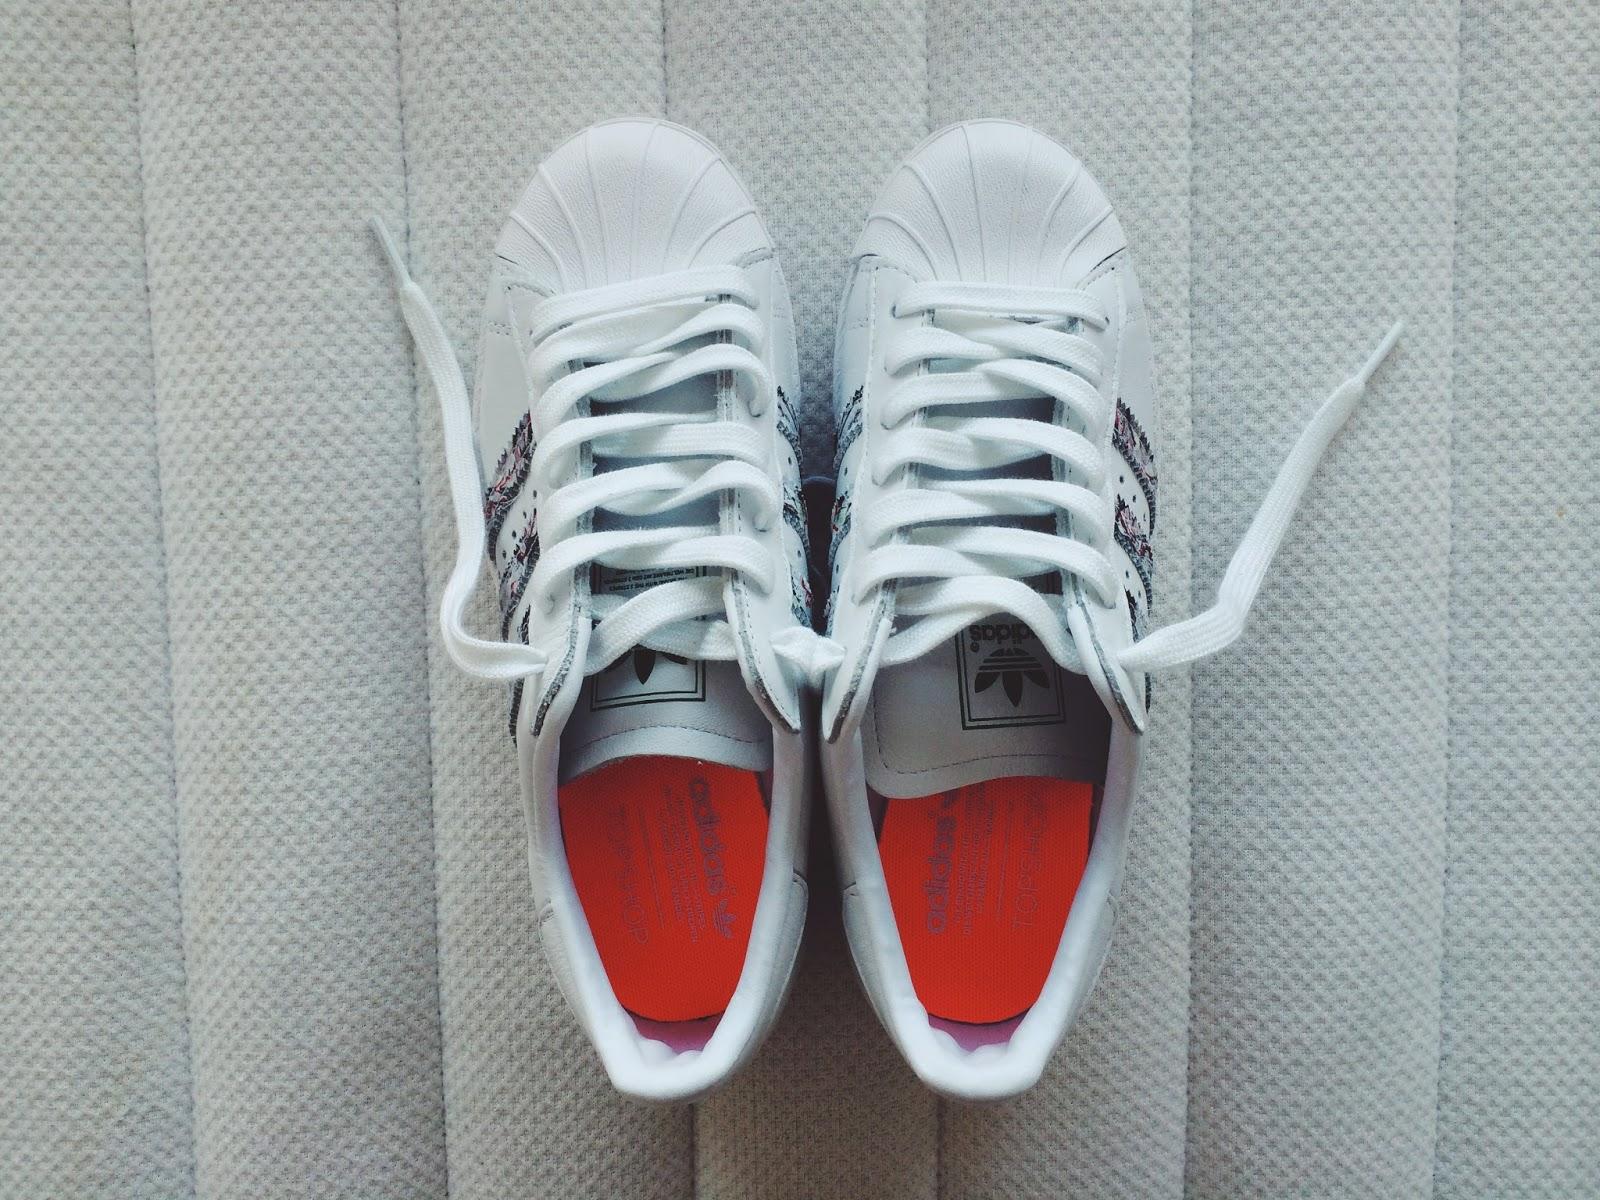 topshop adidas superstar ii adidas originals london